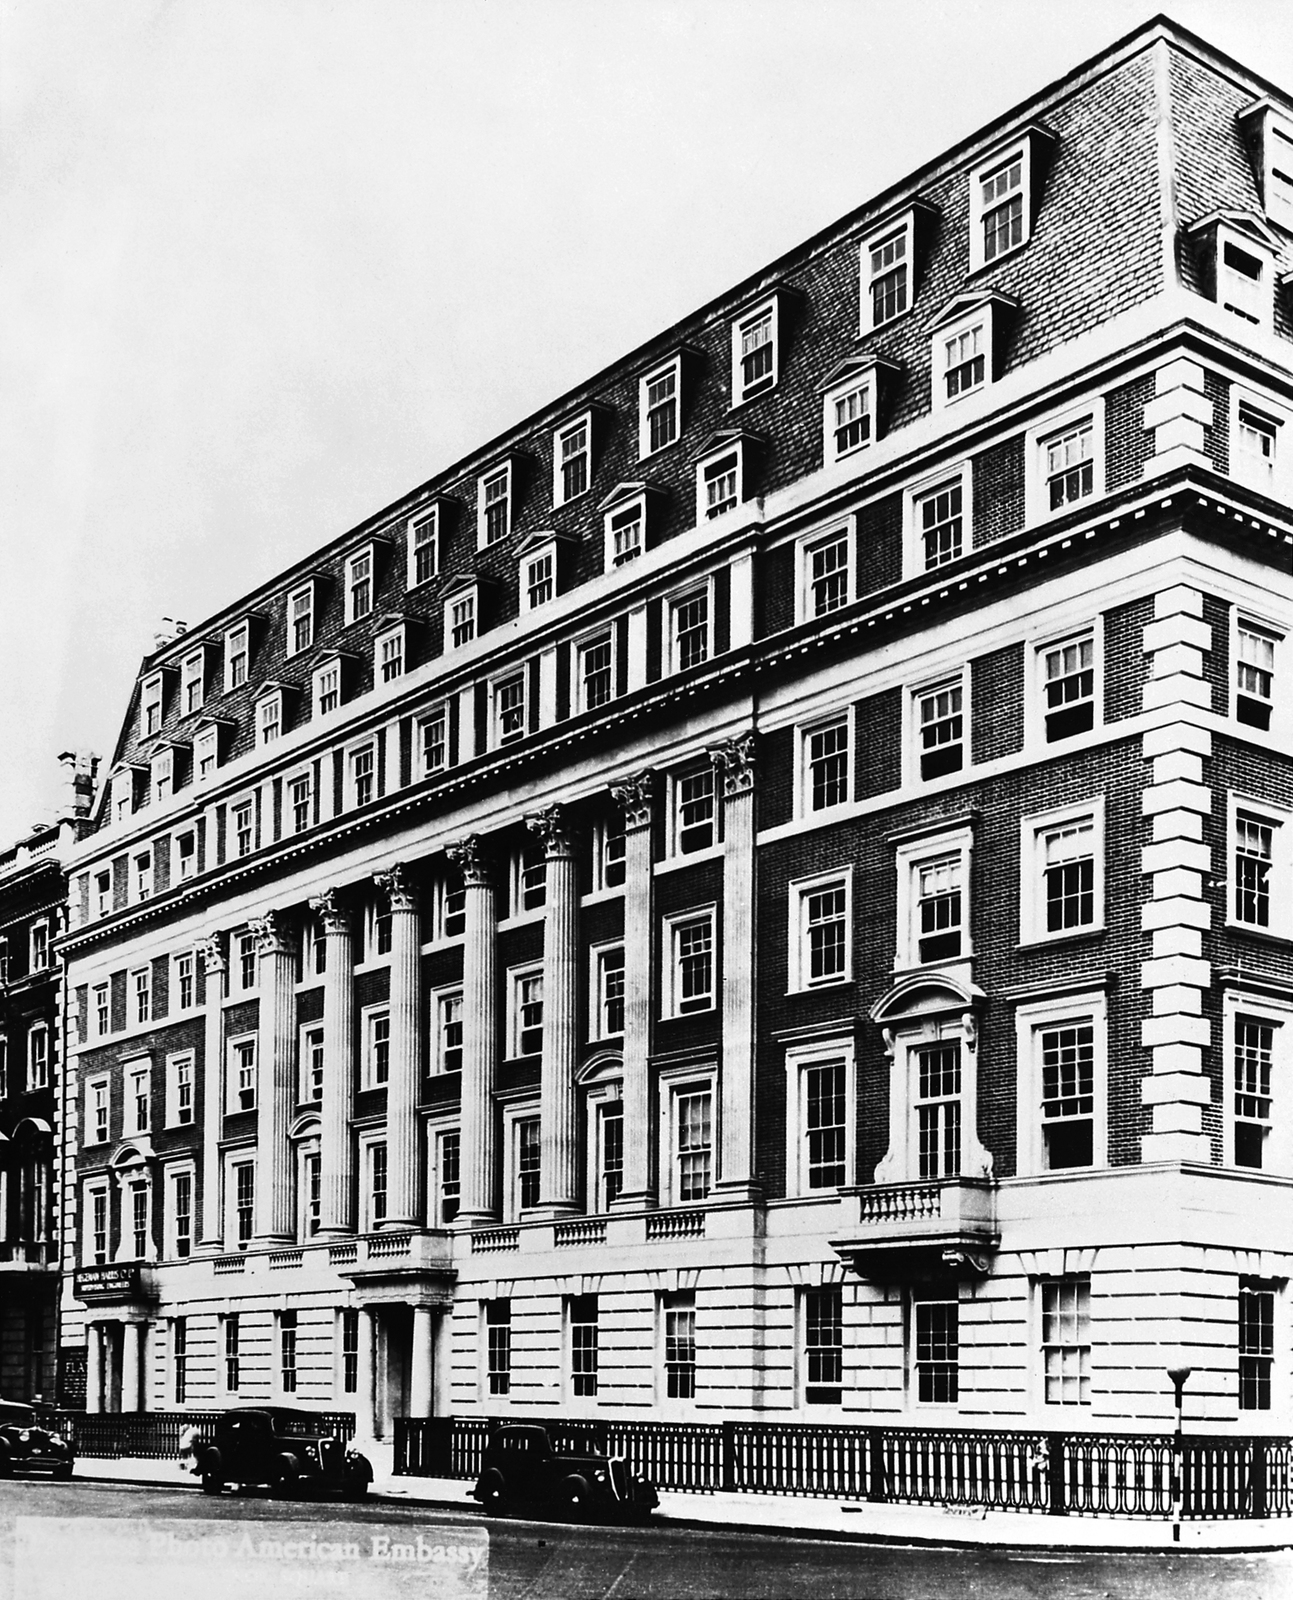 London - Annex Office Building